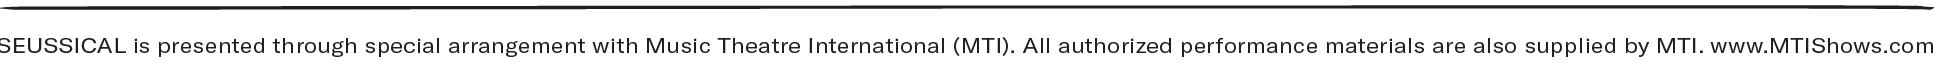 Seussical MTI